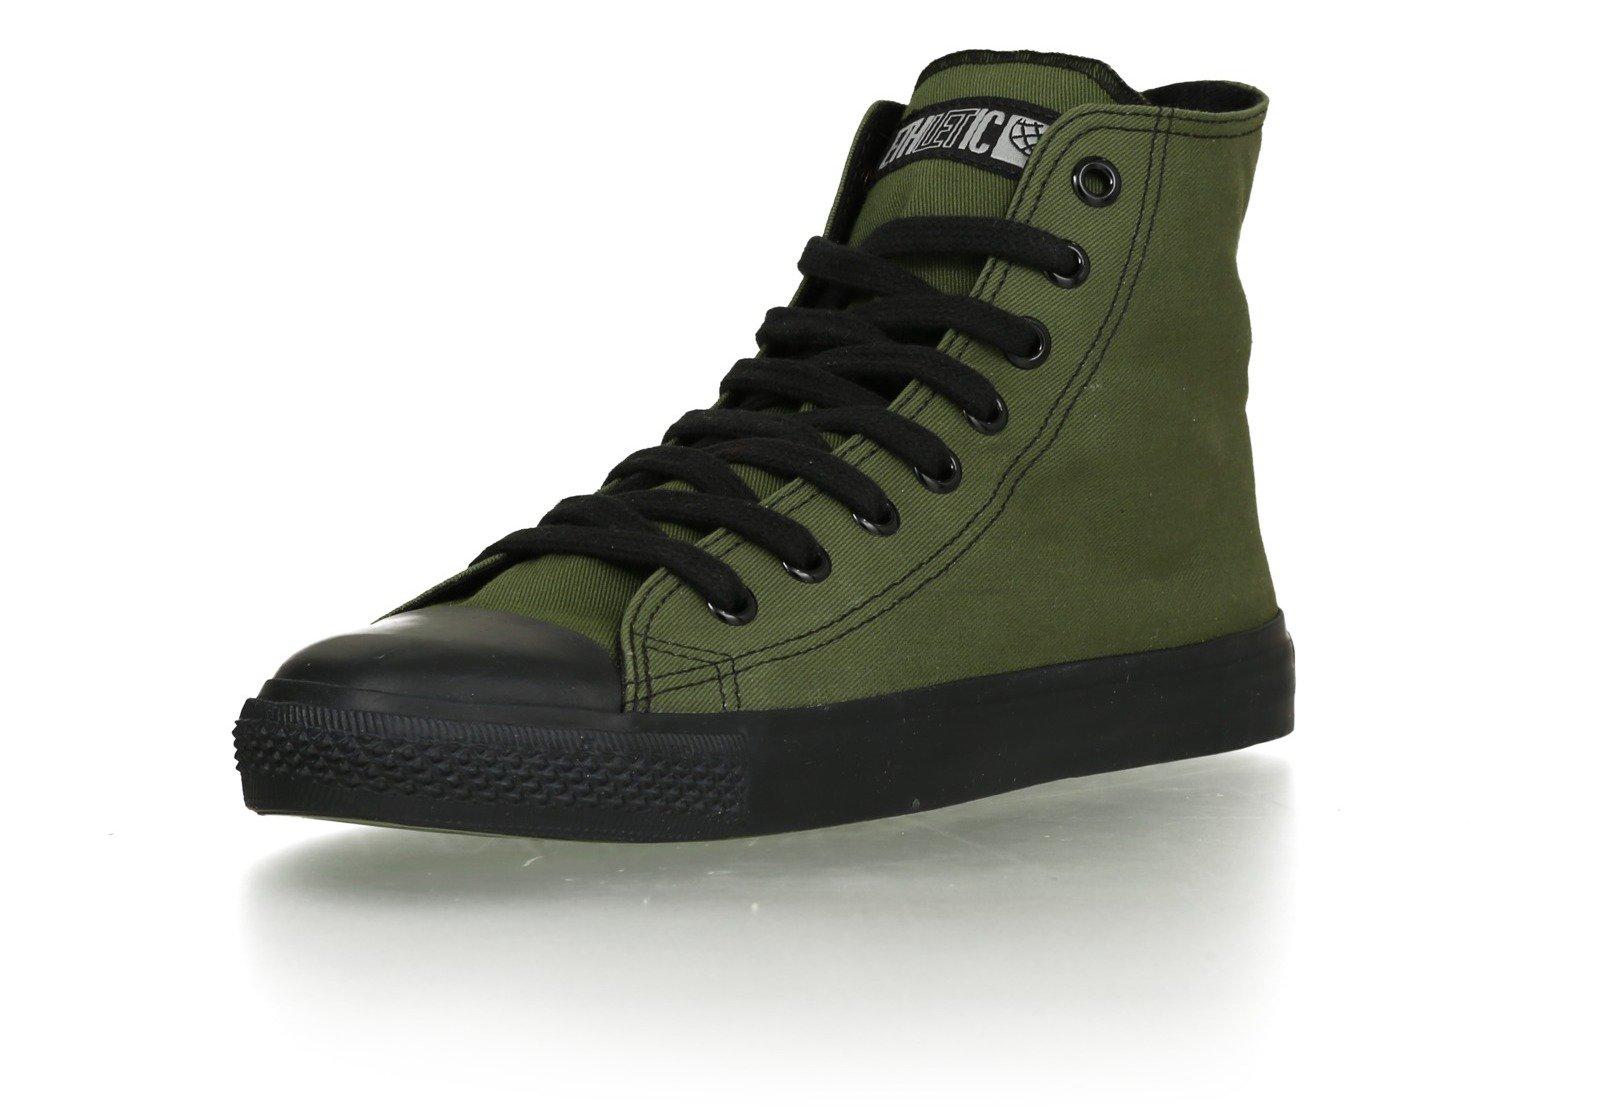 Sneaker aus nachhaltiger Produktion »Black Cap Hi Cut Classic«, schwarz, Jet Black - Jet Black Ethletic